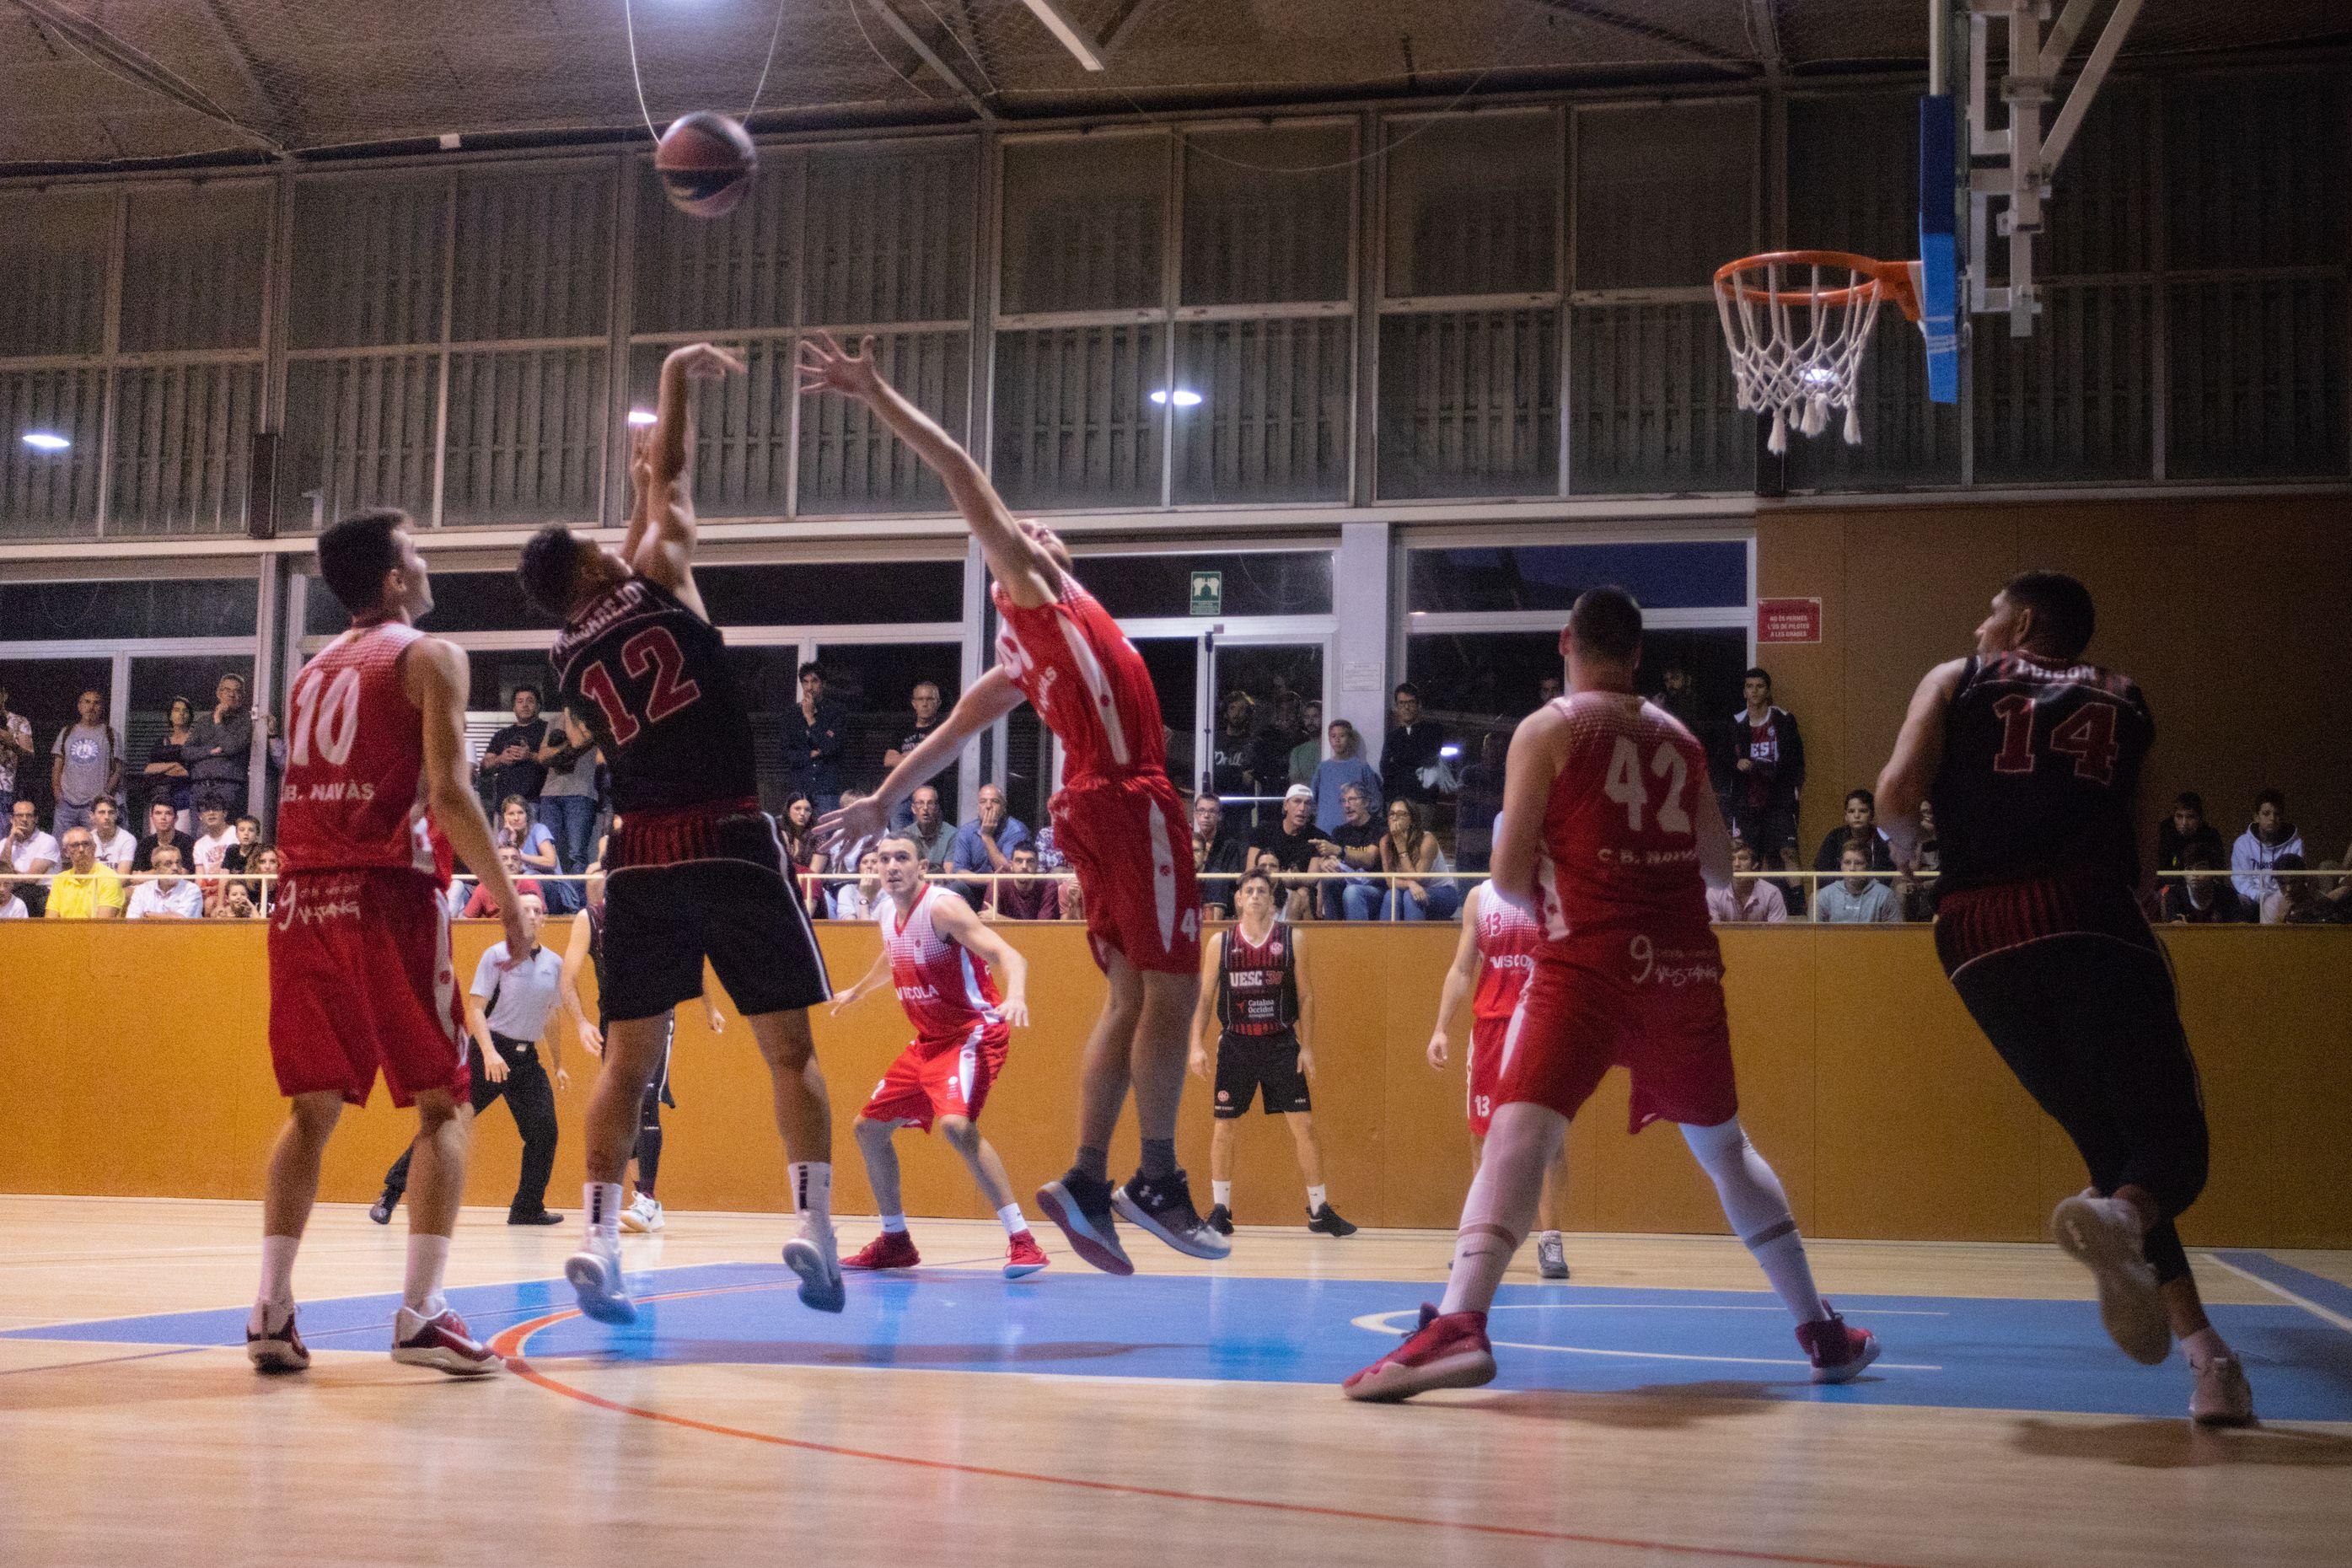 Bàsquet masculí. Partit de lliga. UE Sant Cugat-CB Navàs. Foto: Adrián Gómez.